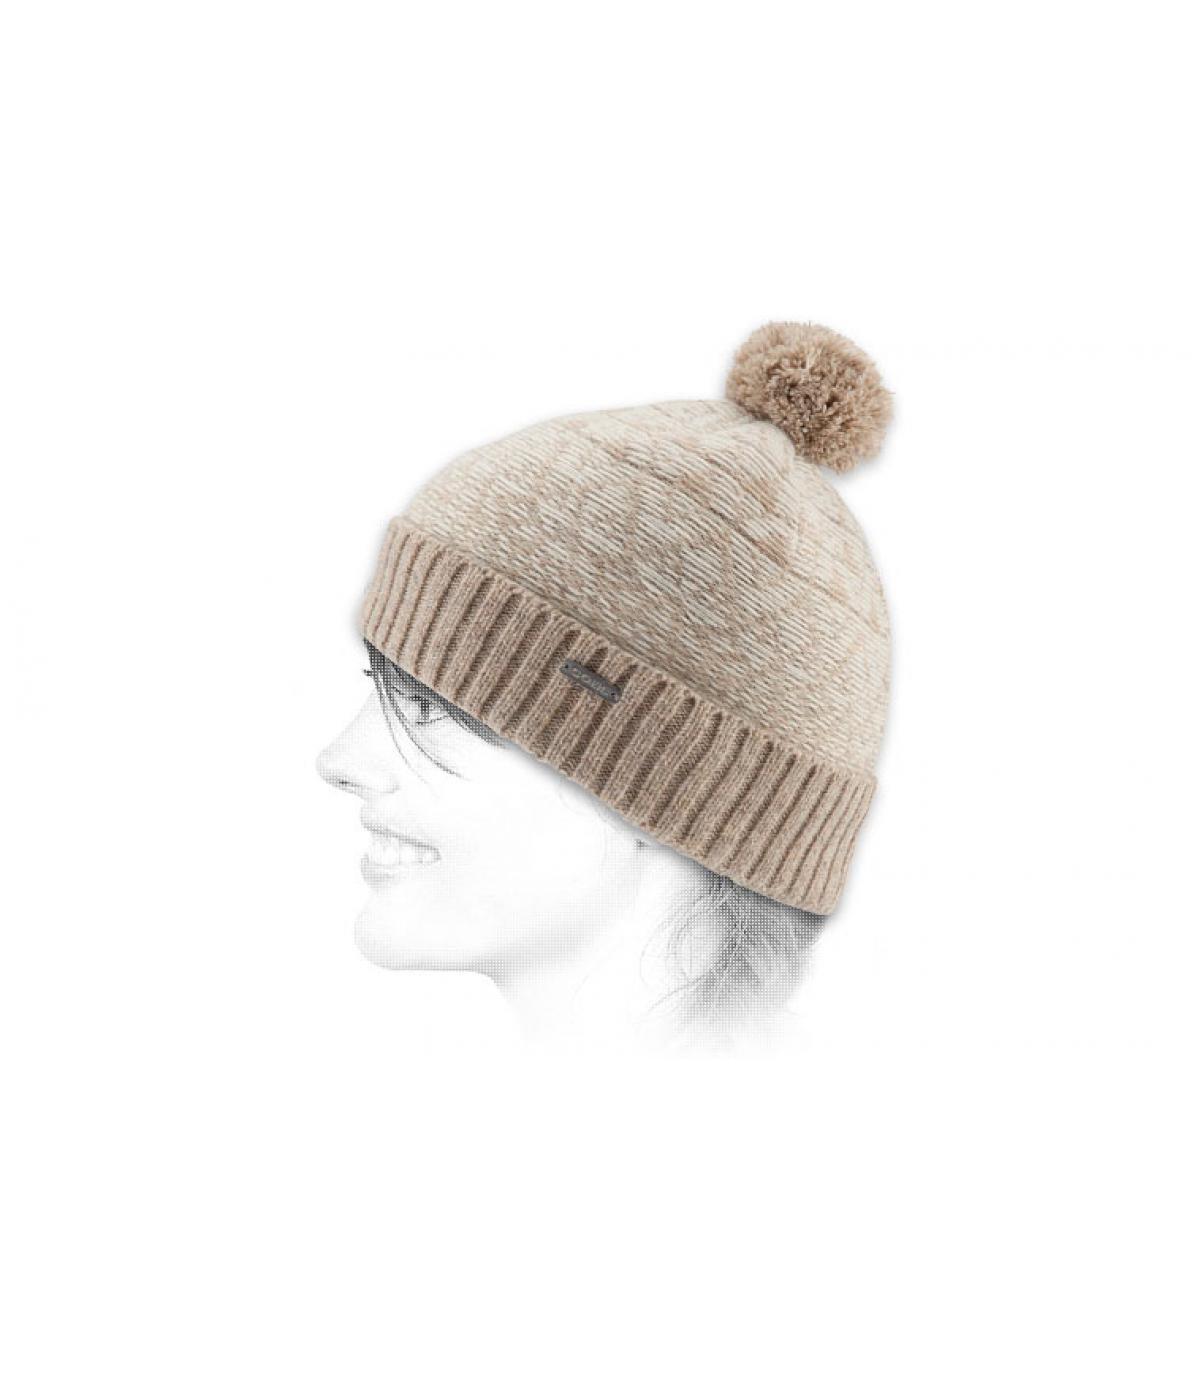 Cremefarbene skandinavische Mütze